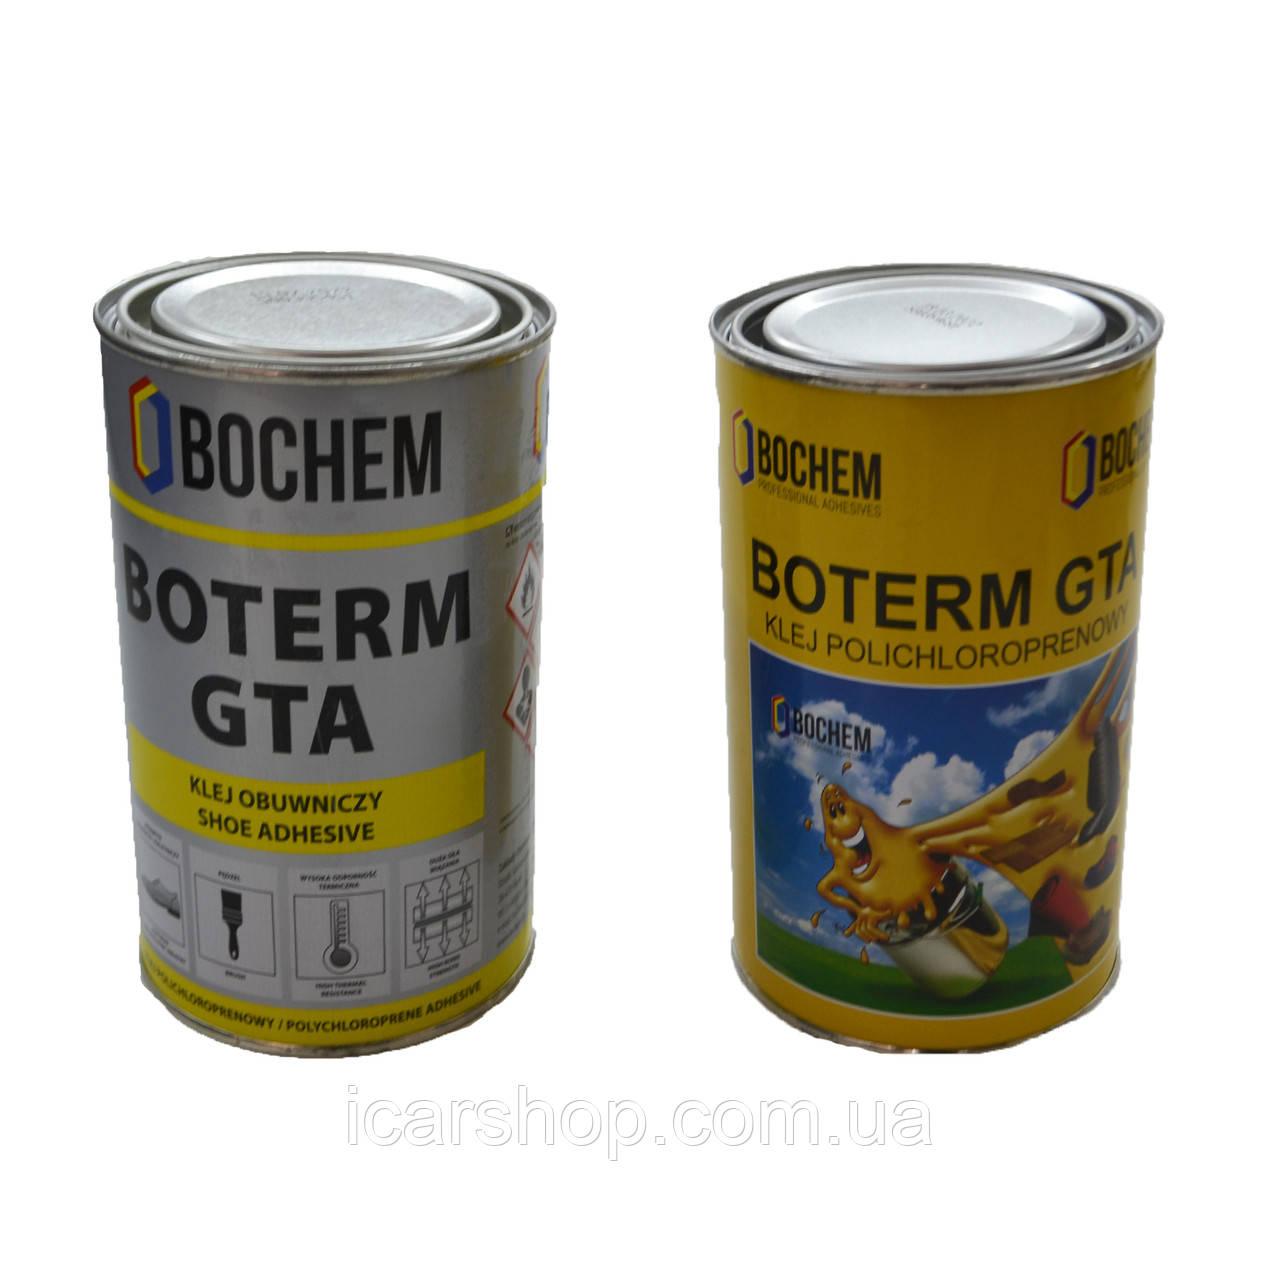 Клей Bochem Boterm GTA 0,8 кг